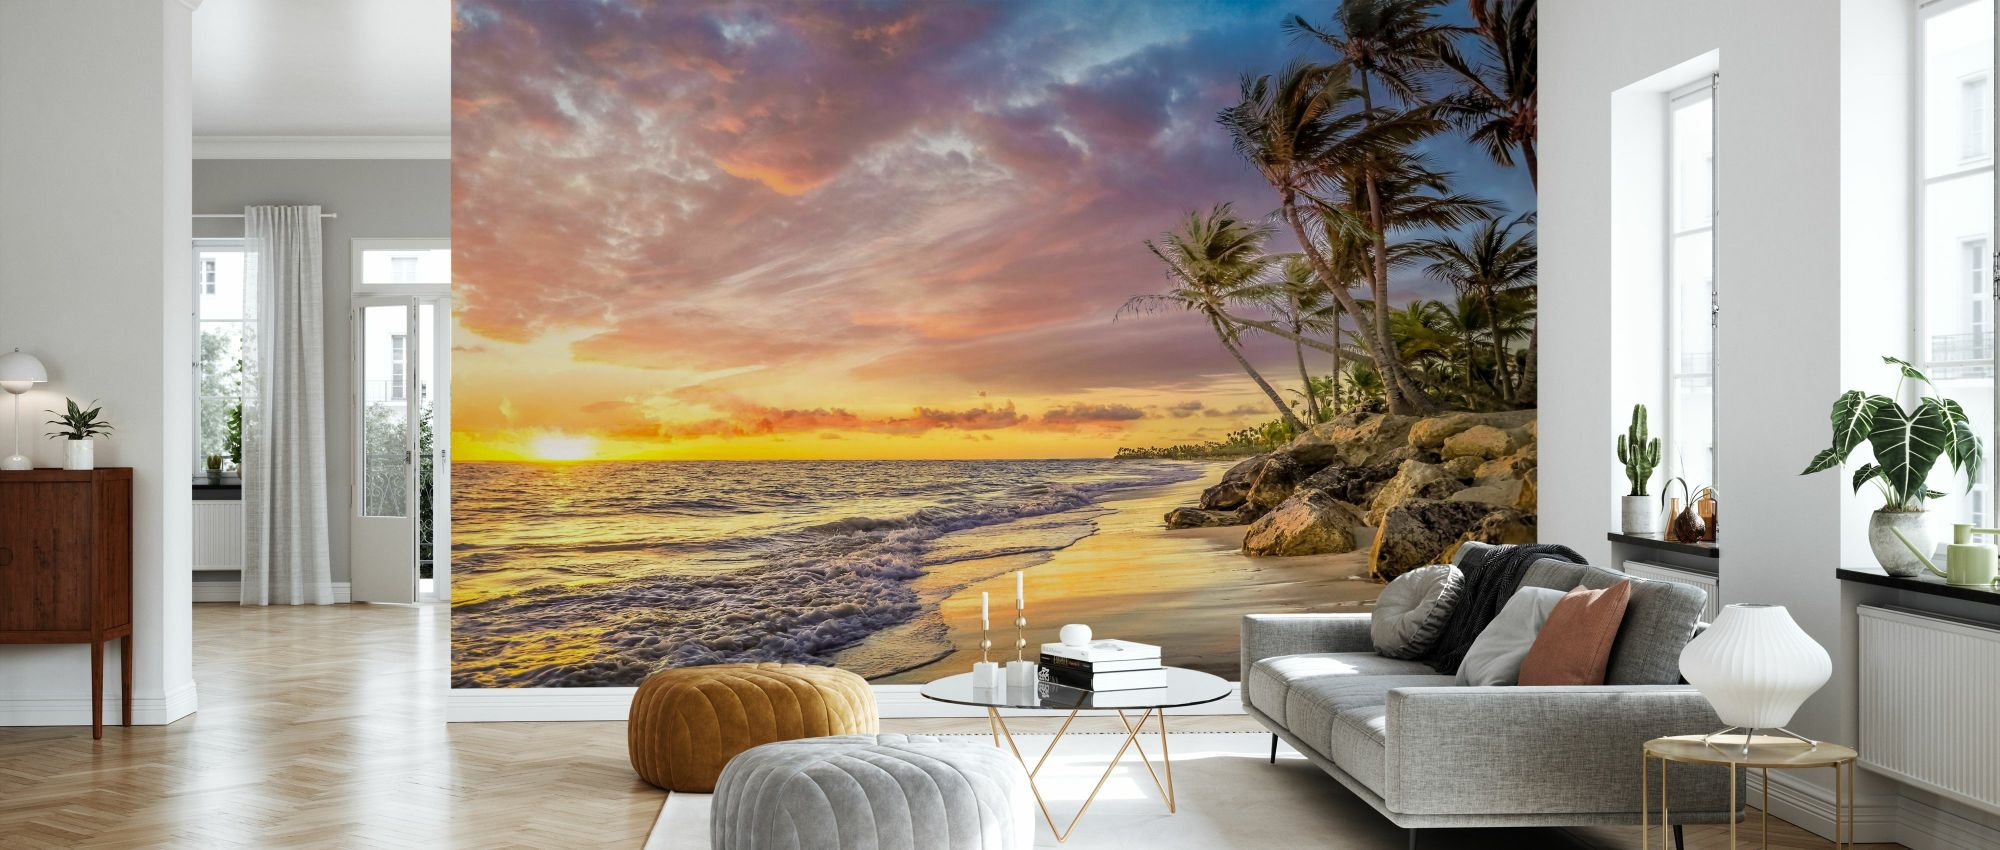 Fotomurale komar road | poster per parete national geographic. Palm Tree In Sunset Fotomurale Su Misura Photowall